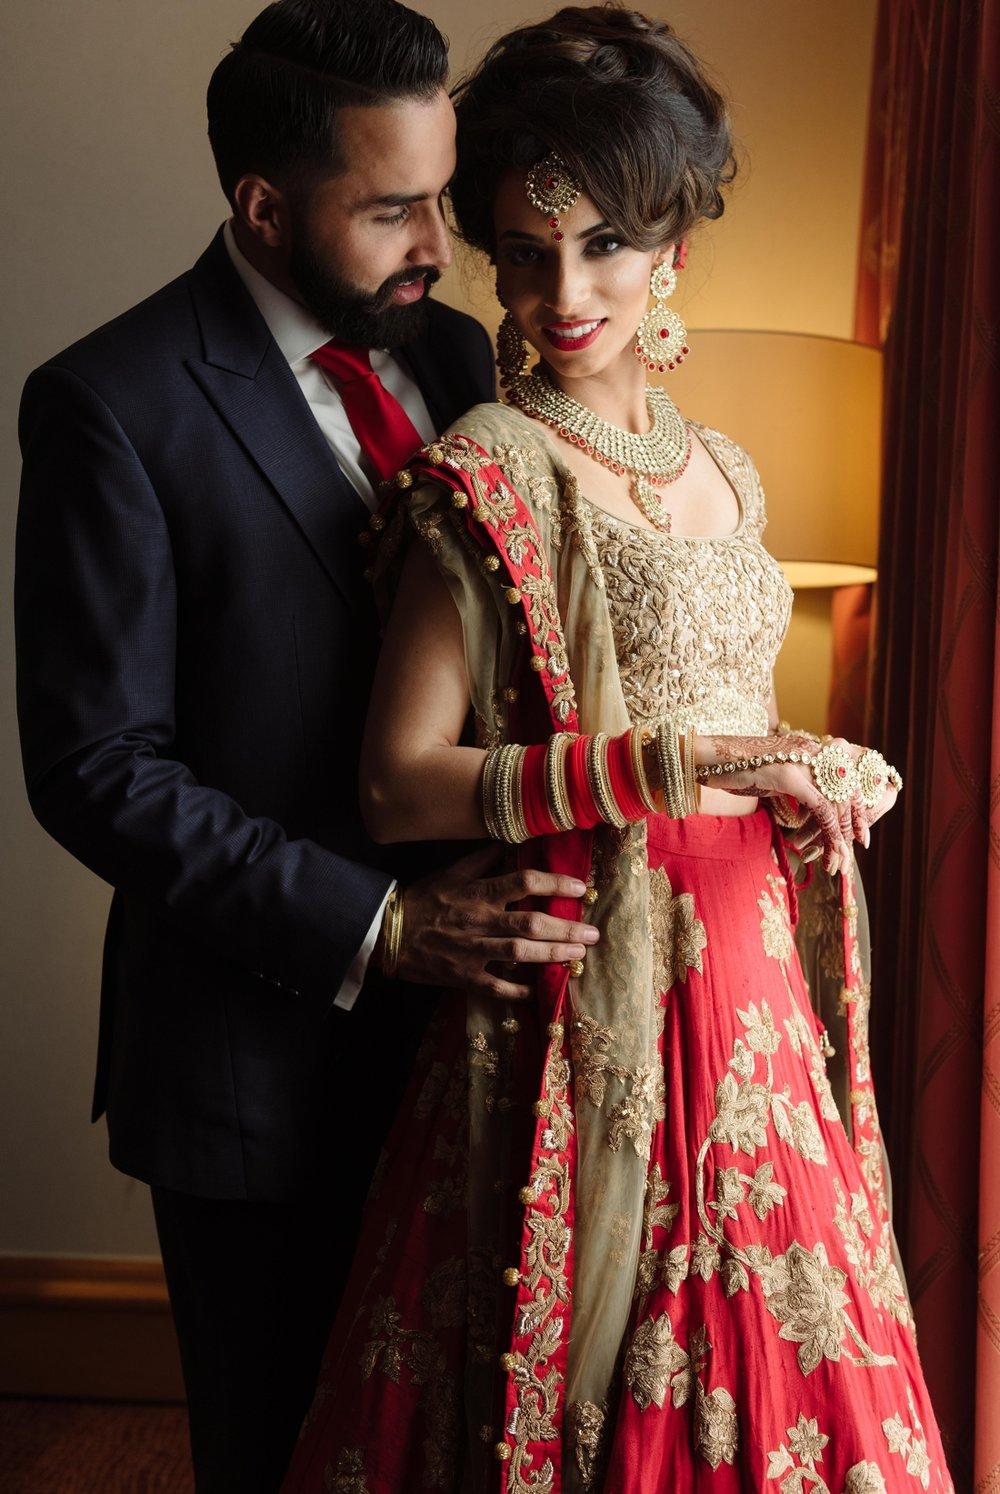 Gurpreet and Nick Sikh Wedding 2 - Southampton - Photos by Abhi 60.jpg